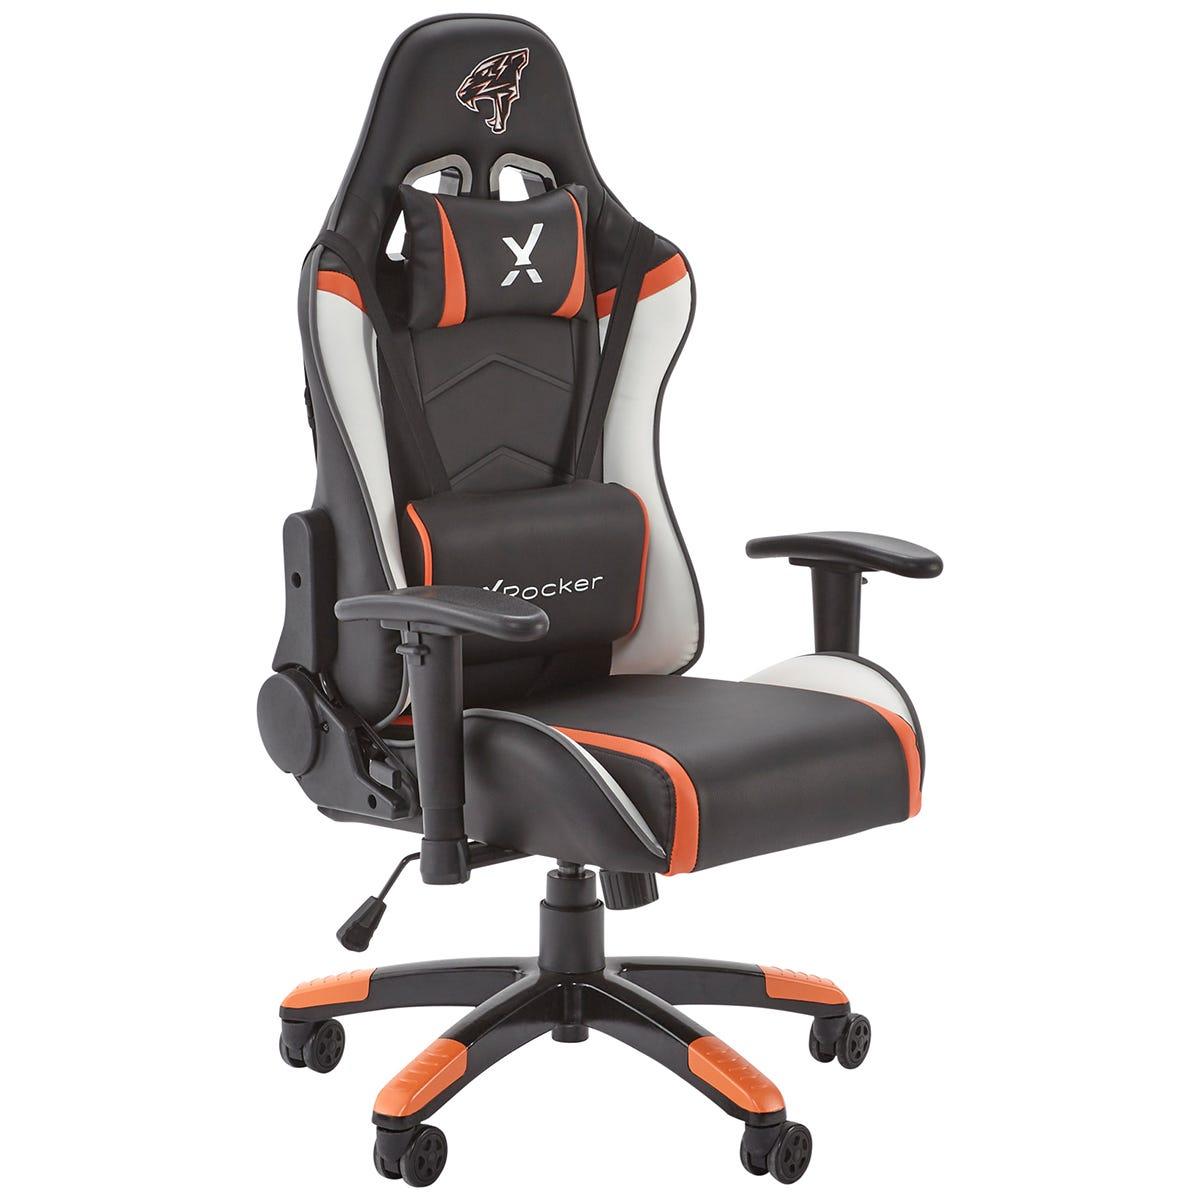 X Rocker X-Rocker Agility Junior PC Gaming Chair - Black/Orange & White